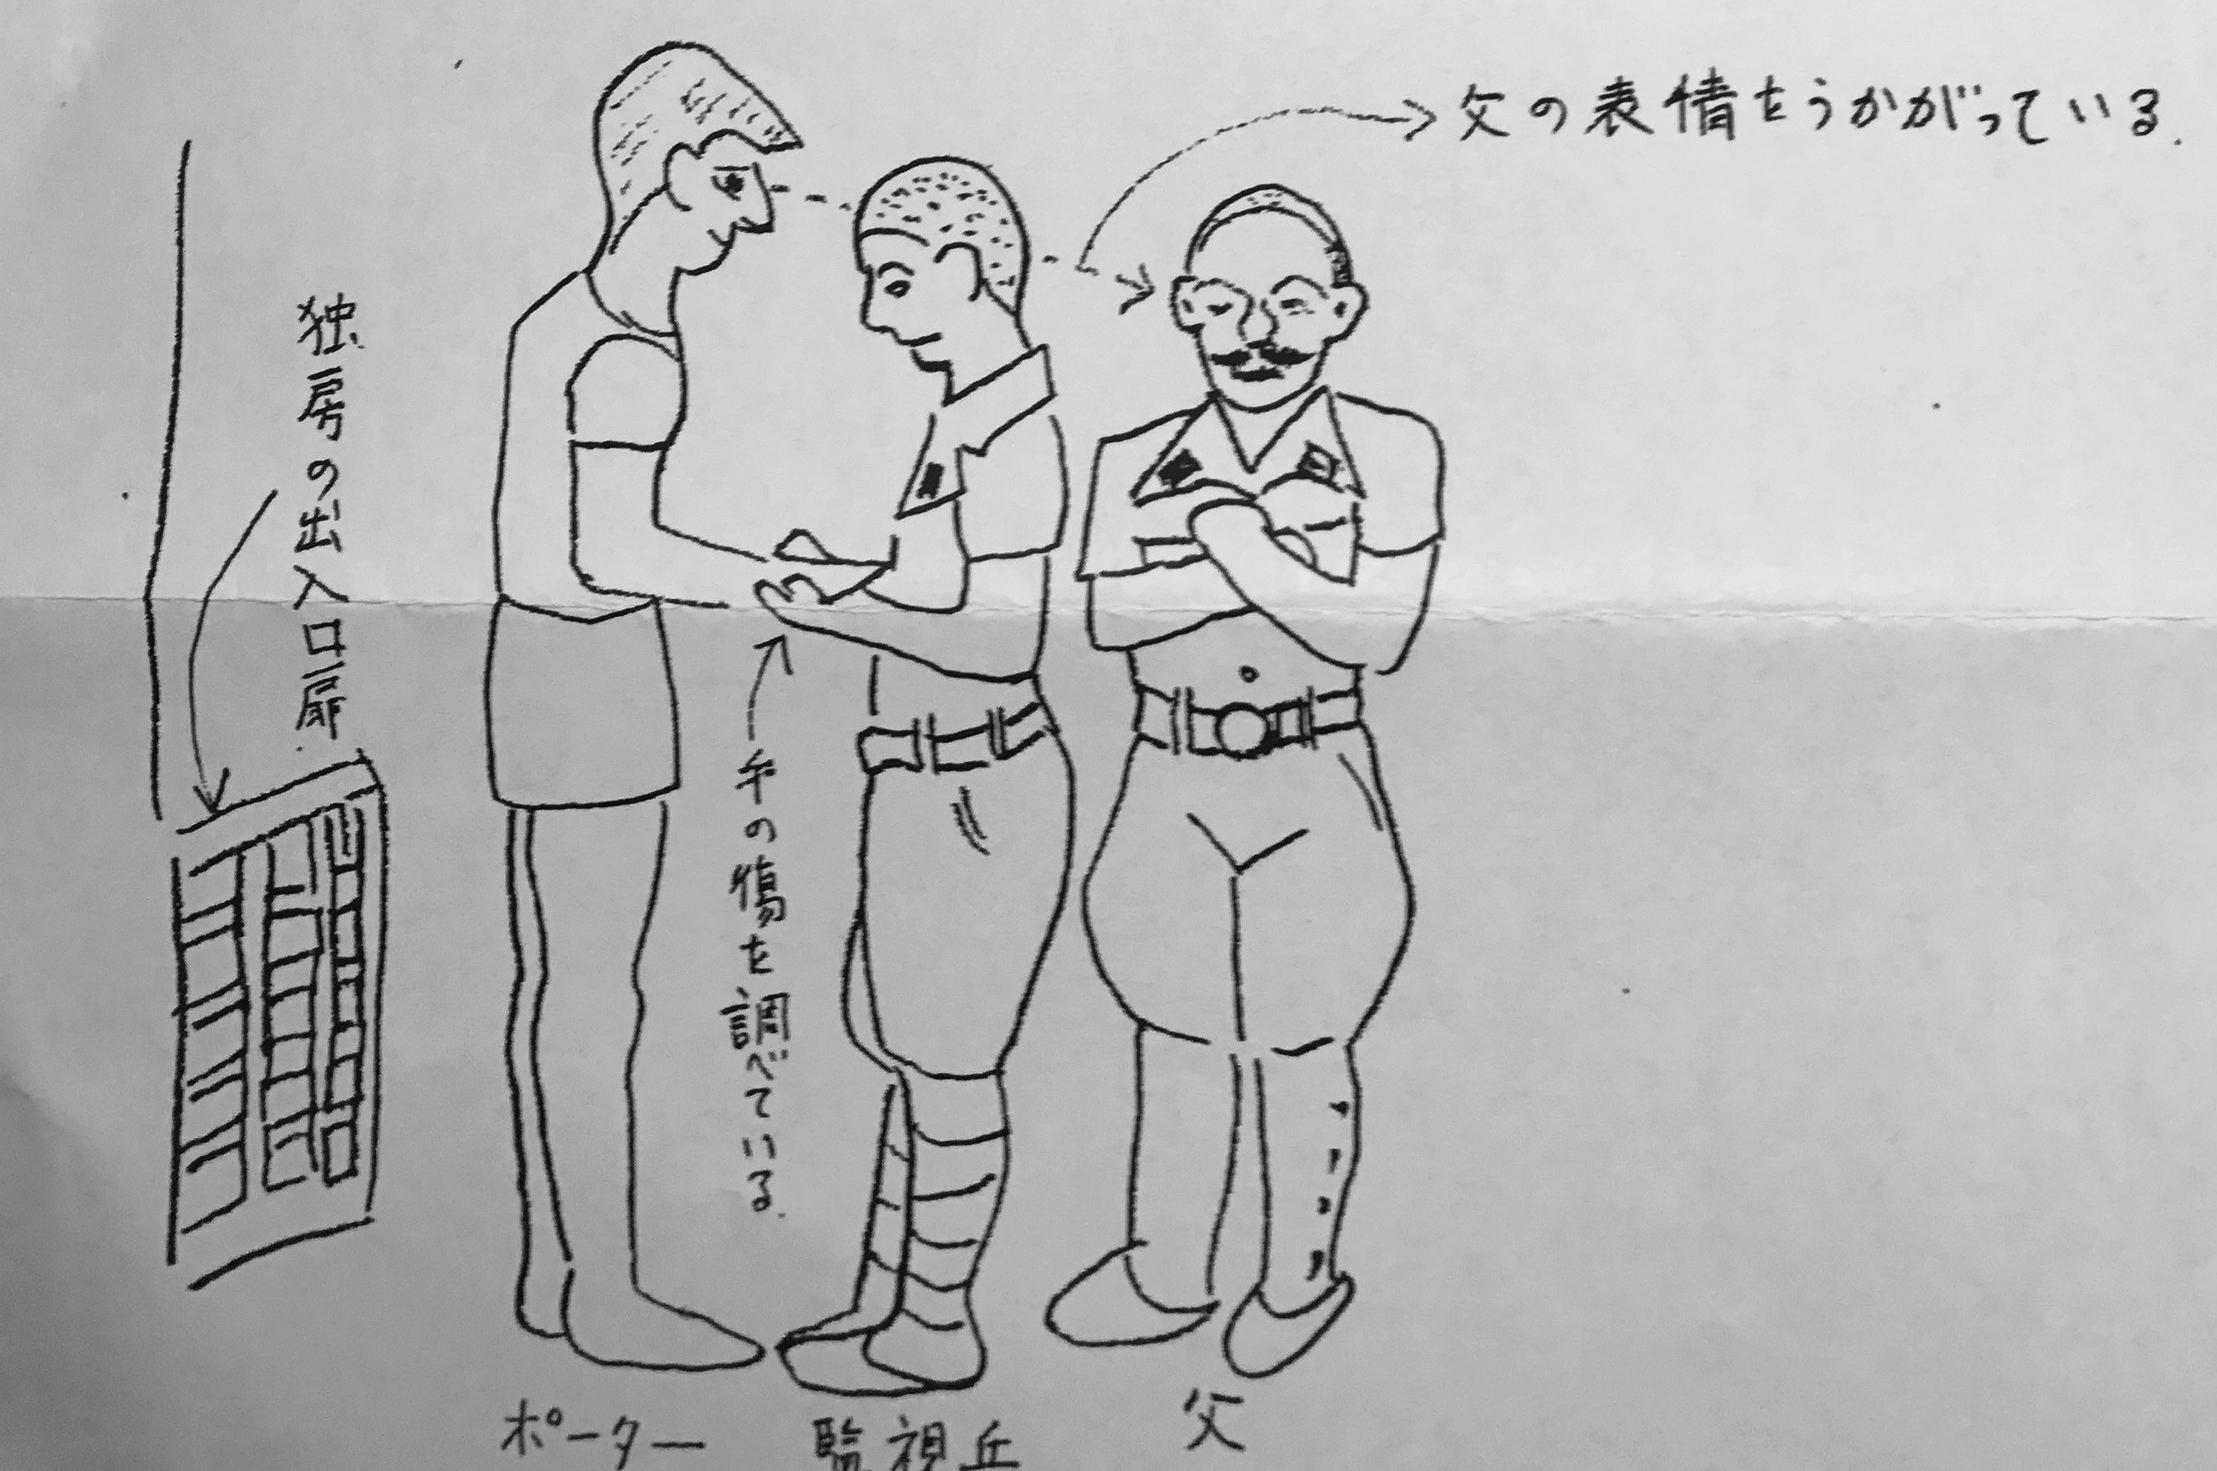 Sketch by Professor Akio Nakamura of of an American POW Raymond Porter, who he saw in the Chugoku MP Headquarters on 5 August, 1945. (Courtesy Dr. Akio Nakamura.)